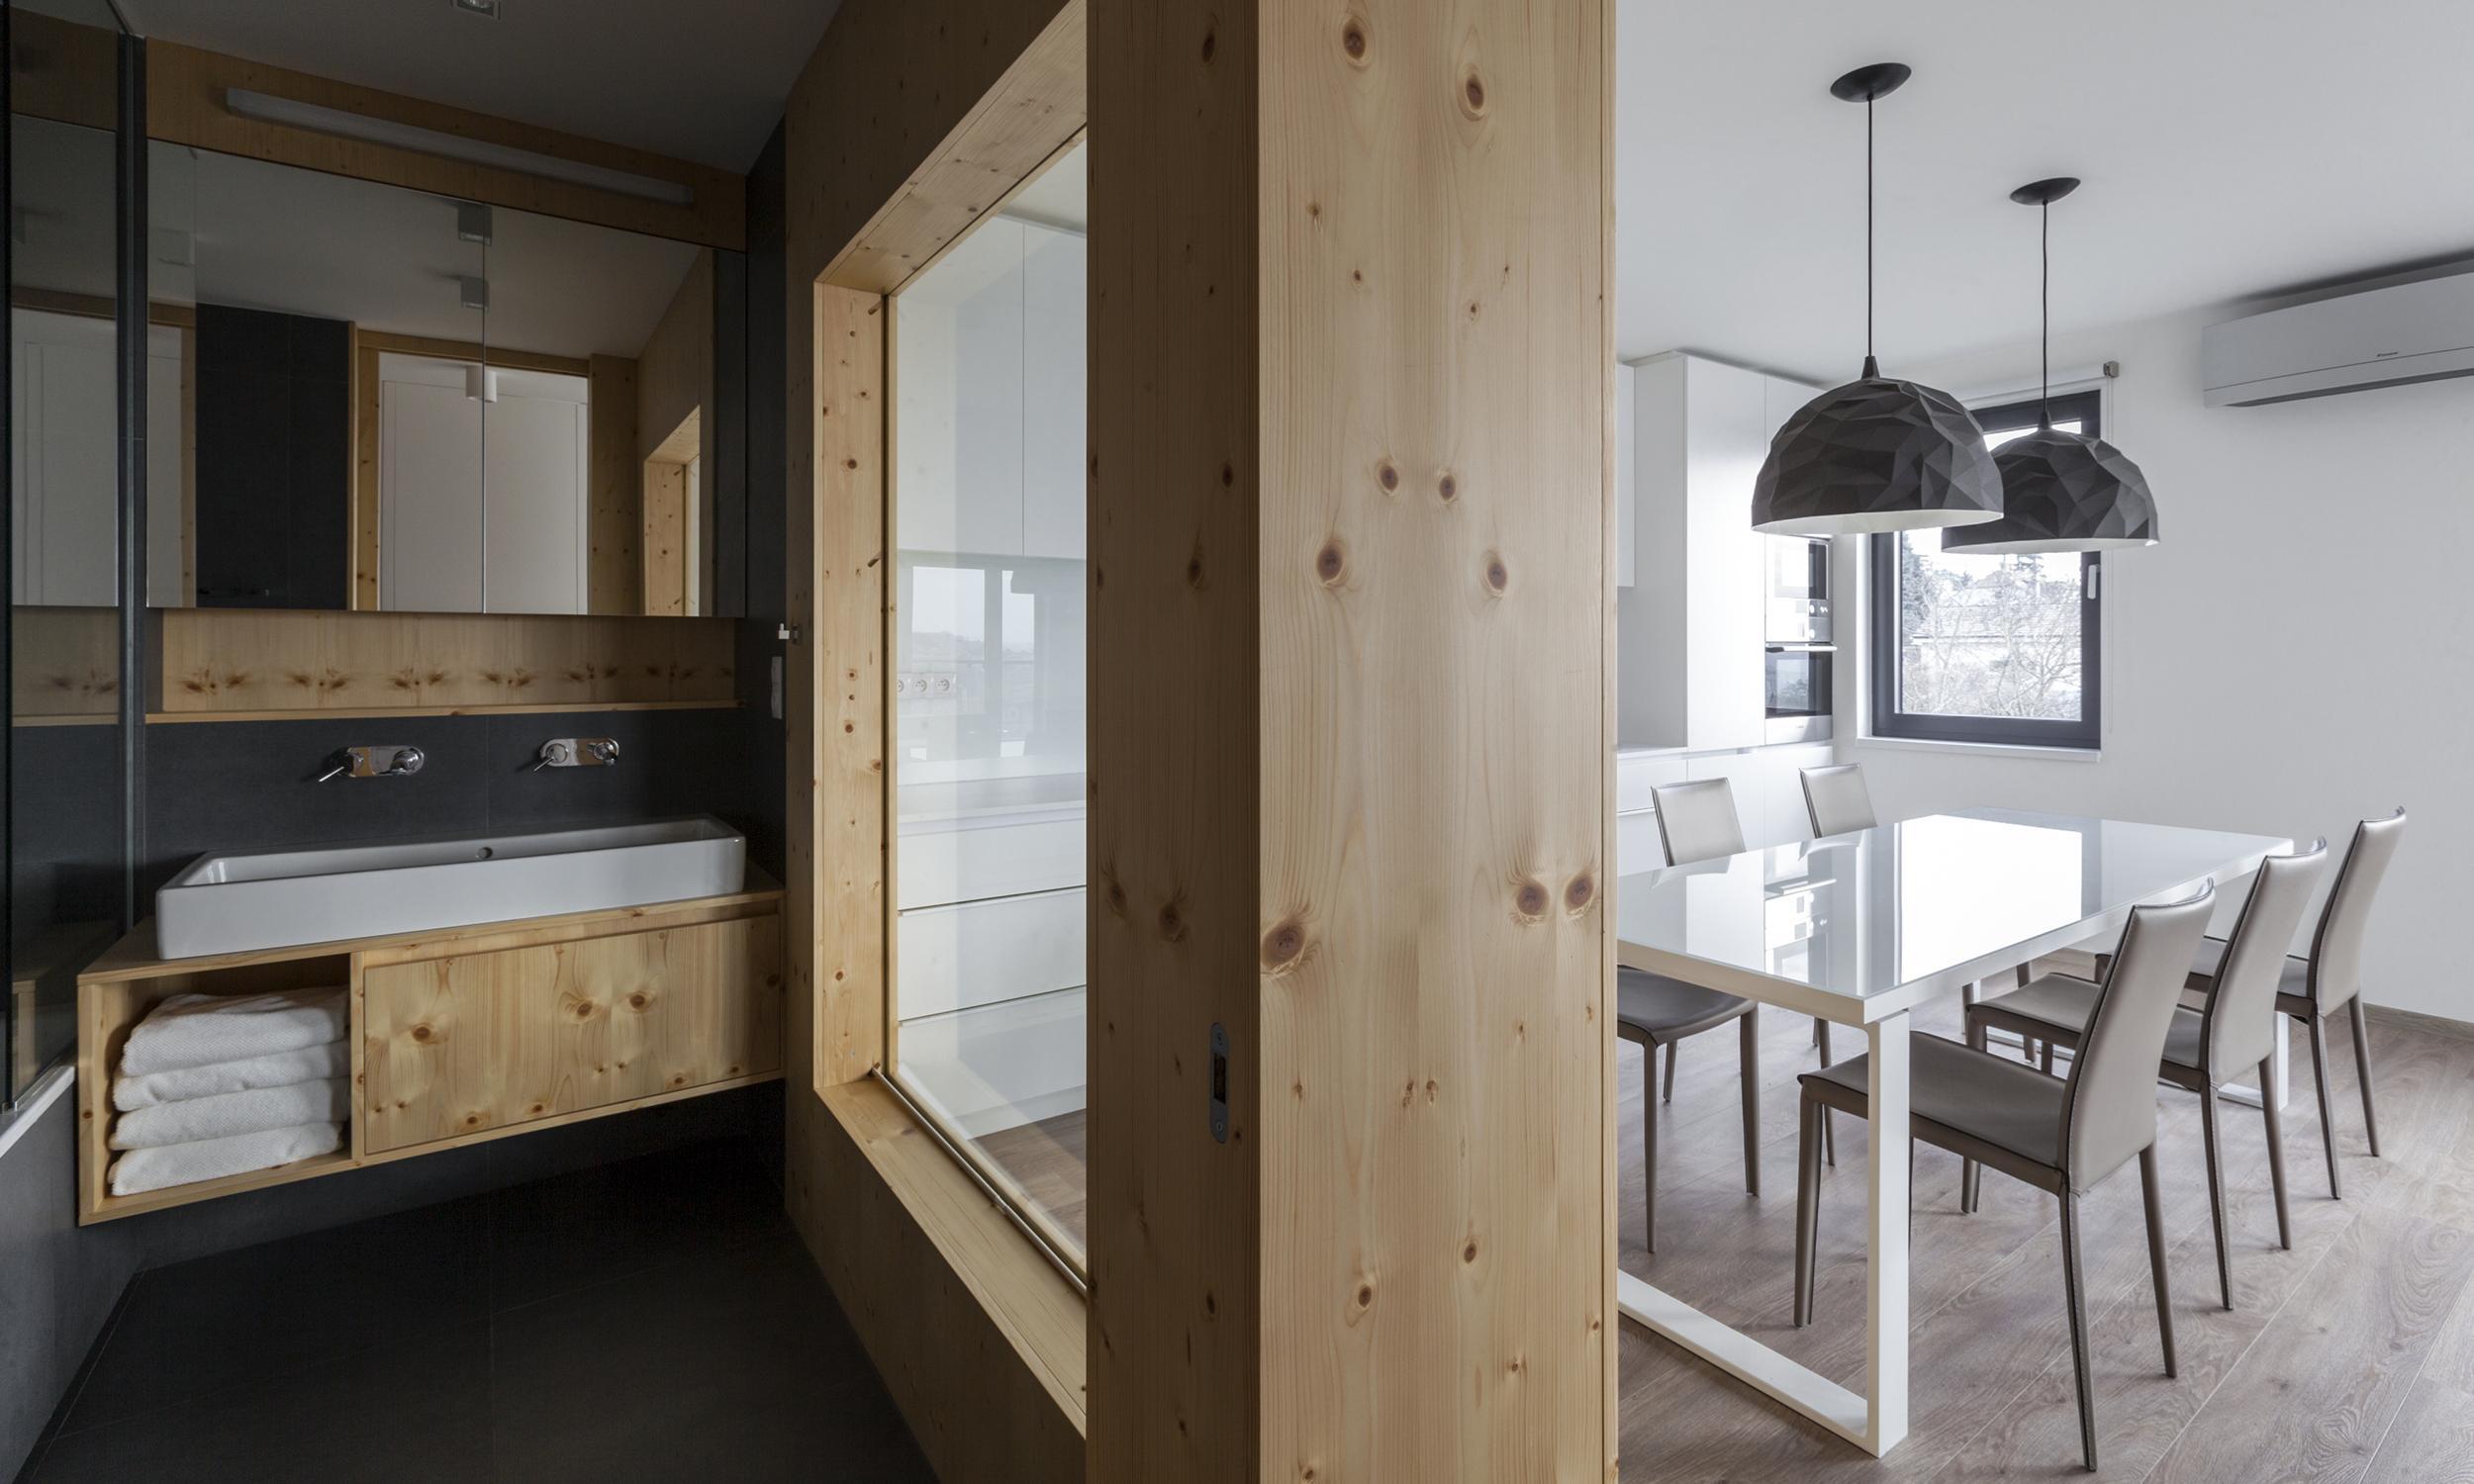 Stolar Okna : Three room apartment with a concrete wall bratislava slovakia